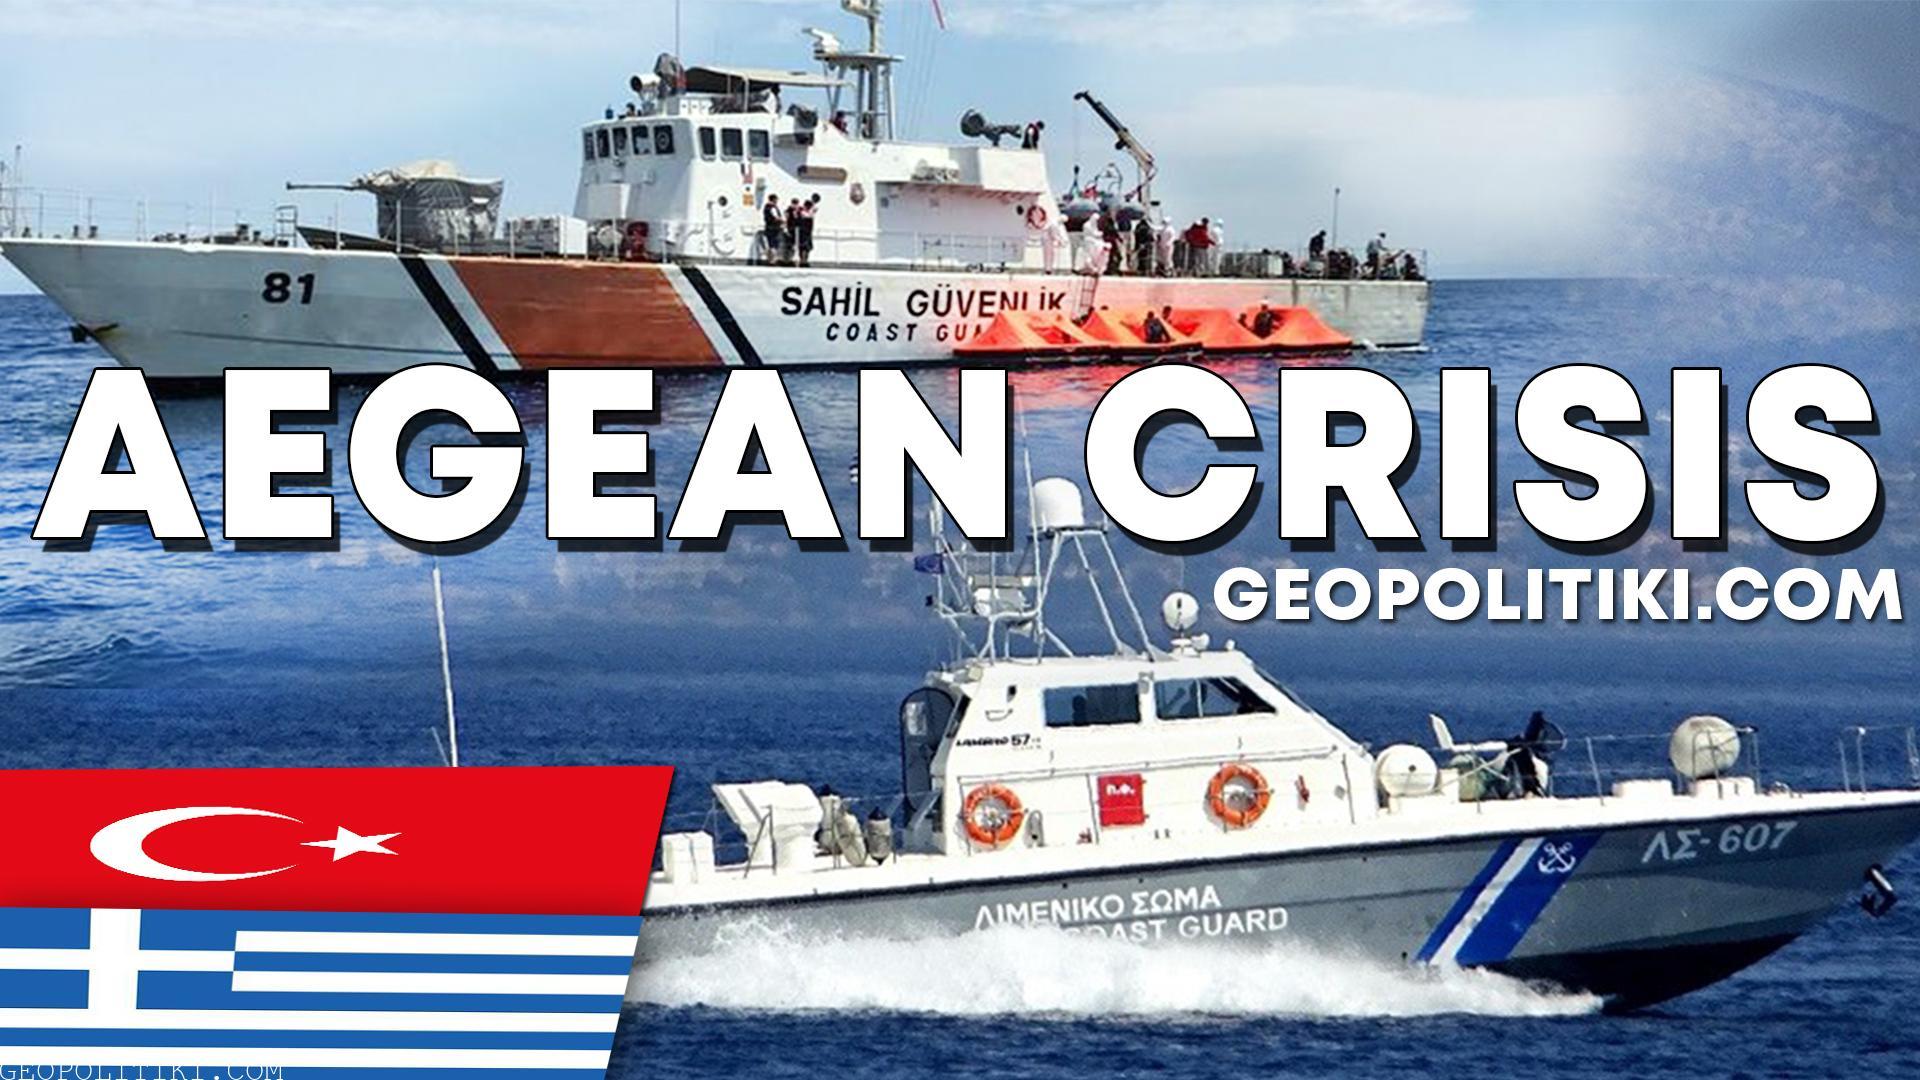 AEGEAN CRISIS: Turkish coast guard harassed Greek Patrol boat